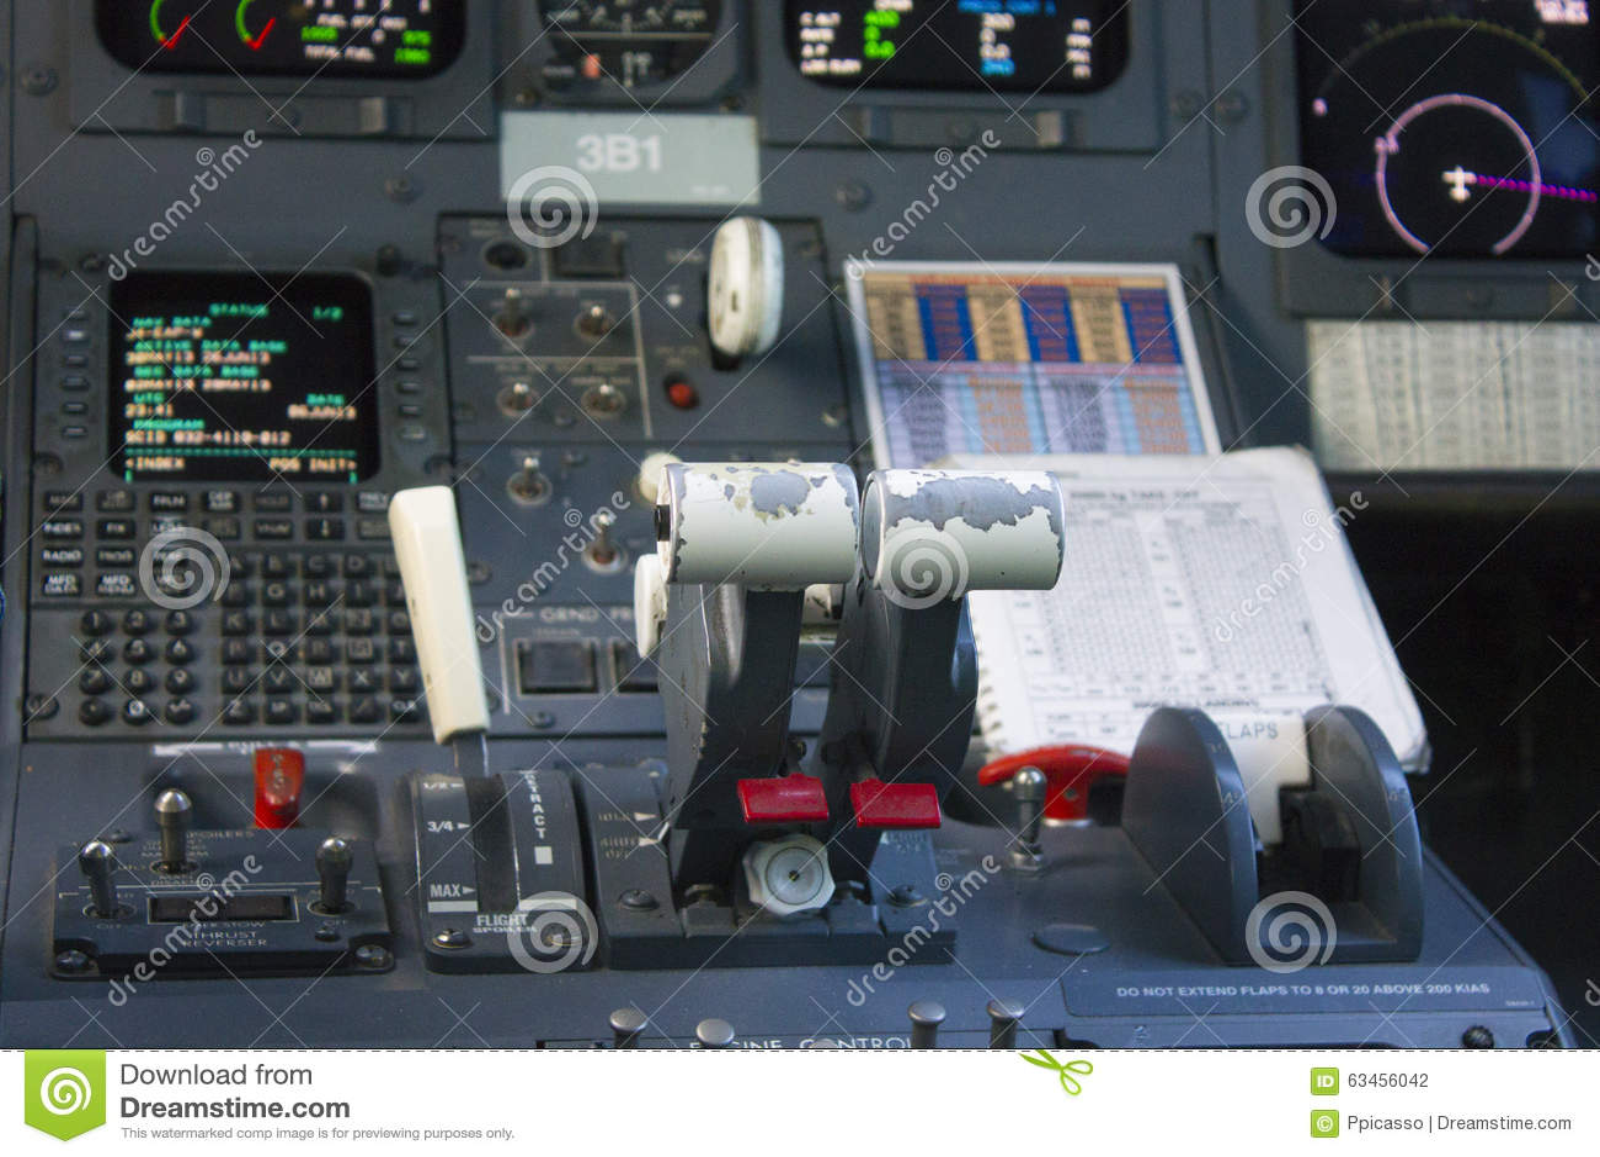 X-Plane 11 Flight Simulator | More Powerful. Made Usable.